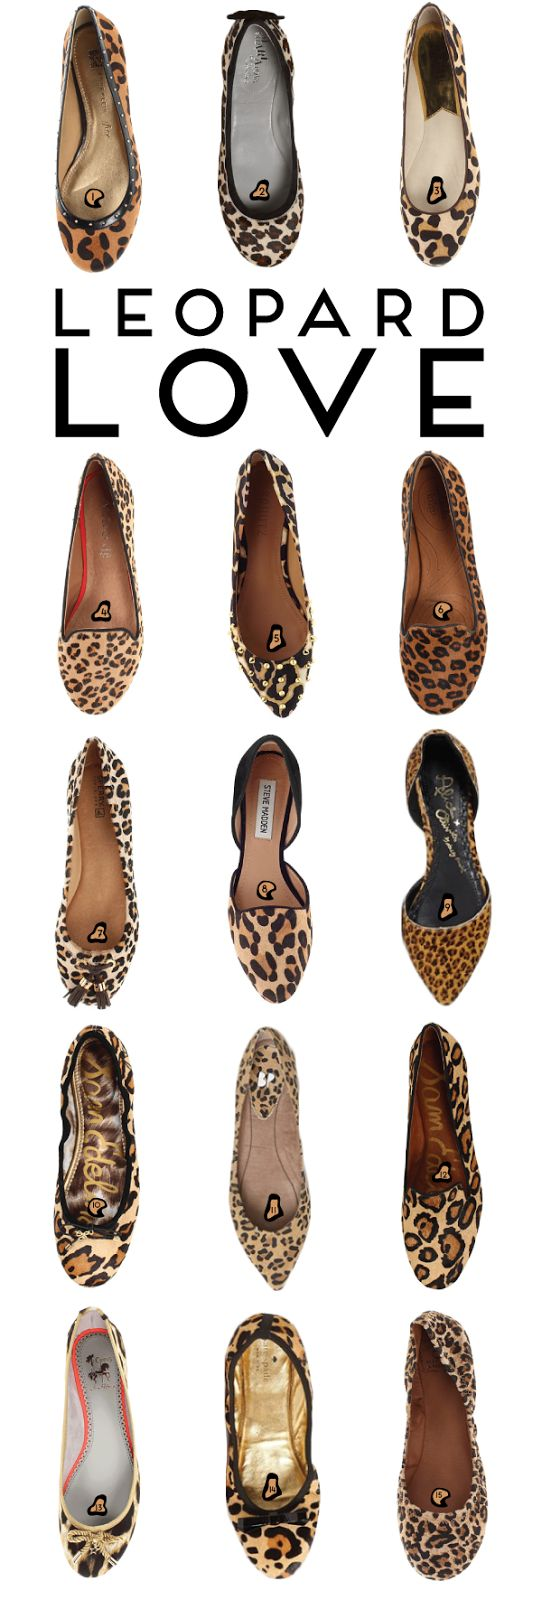 Inspirational Designer High Heels